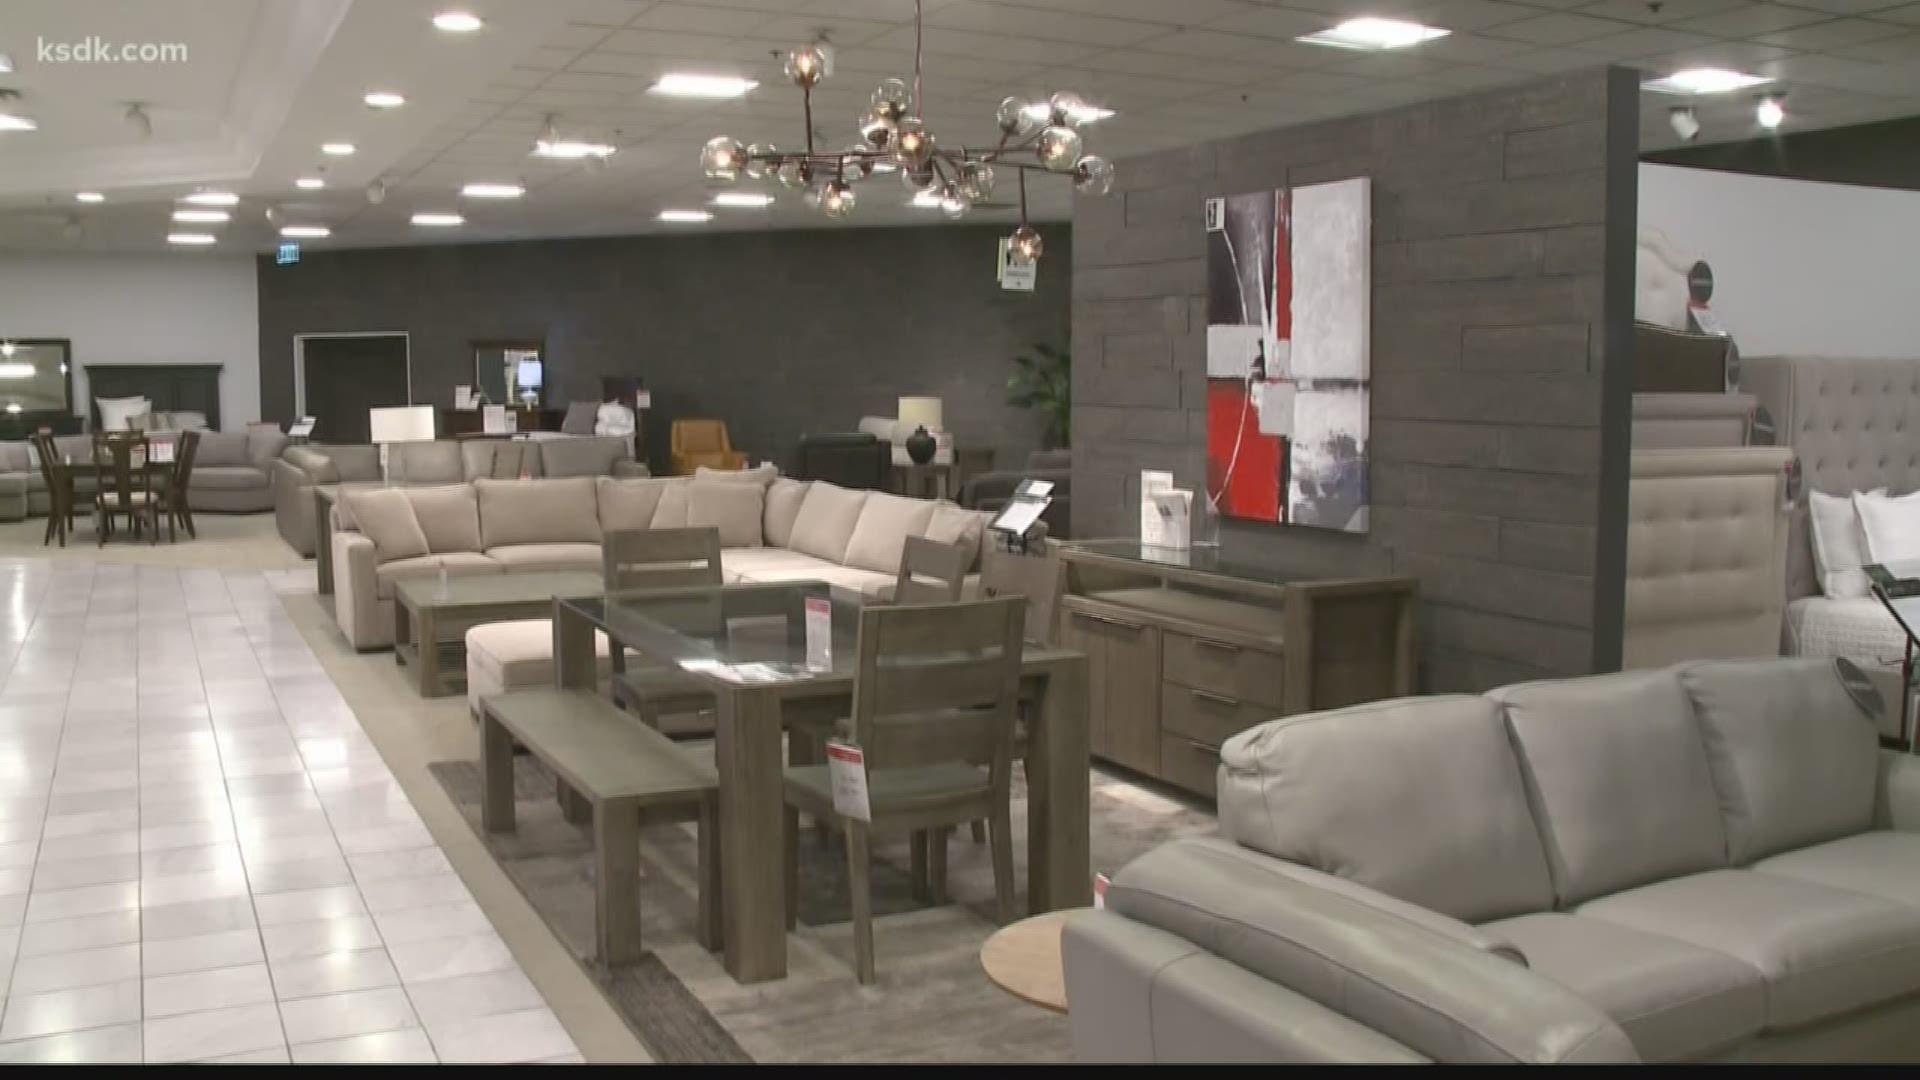 The Furniture Department At Macy S Got, Macys Furniture Gallery Dallas